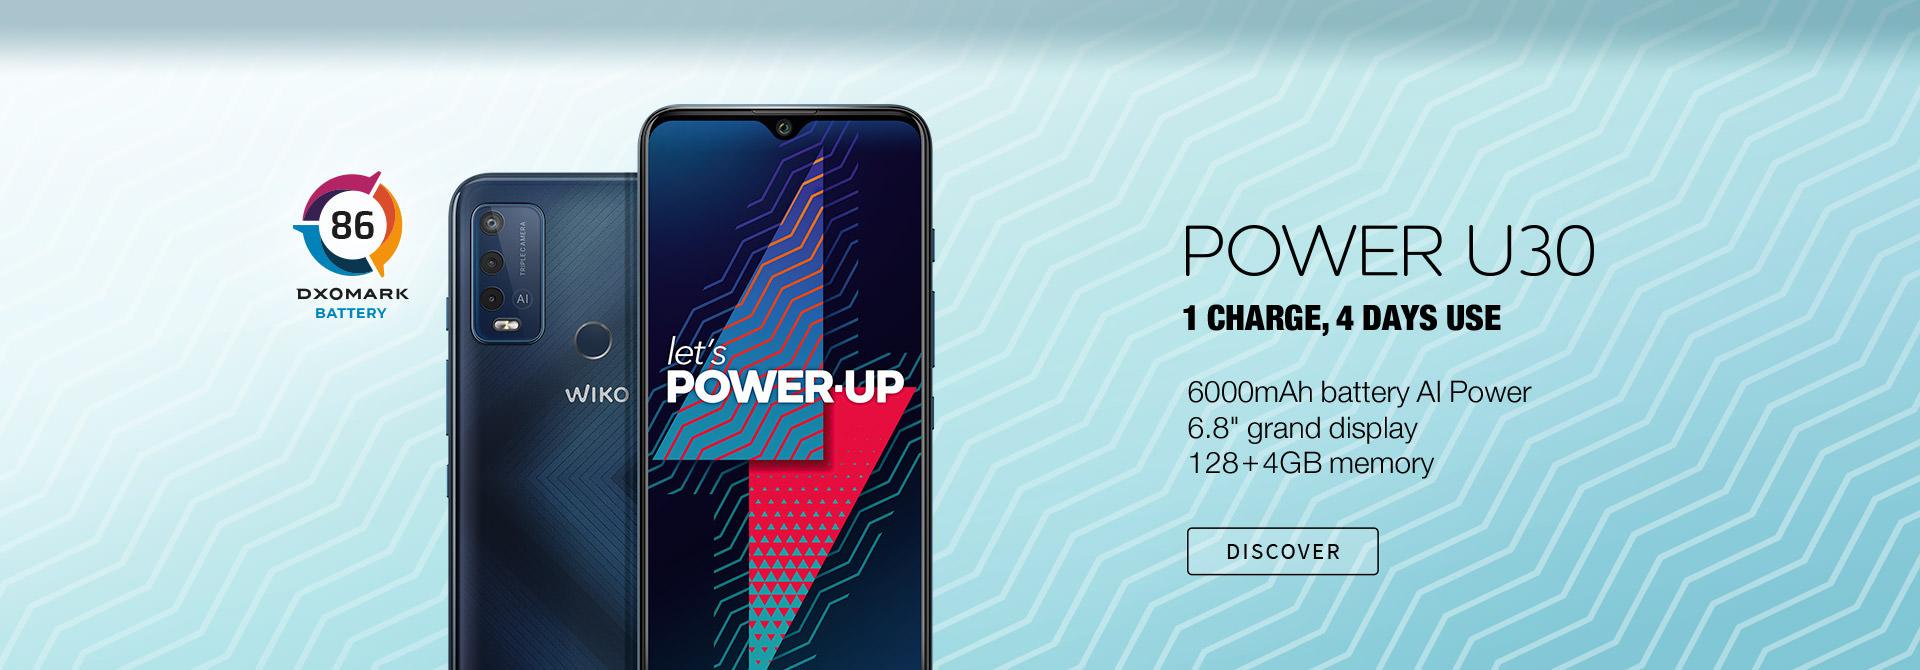 POWER U30 (64+4GB)